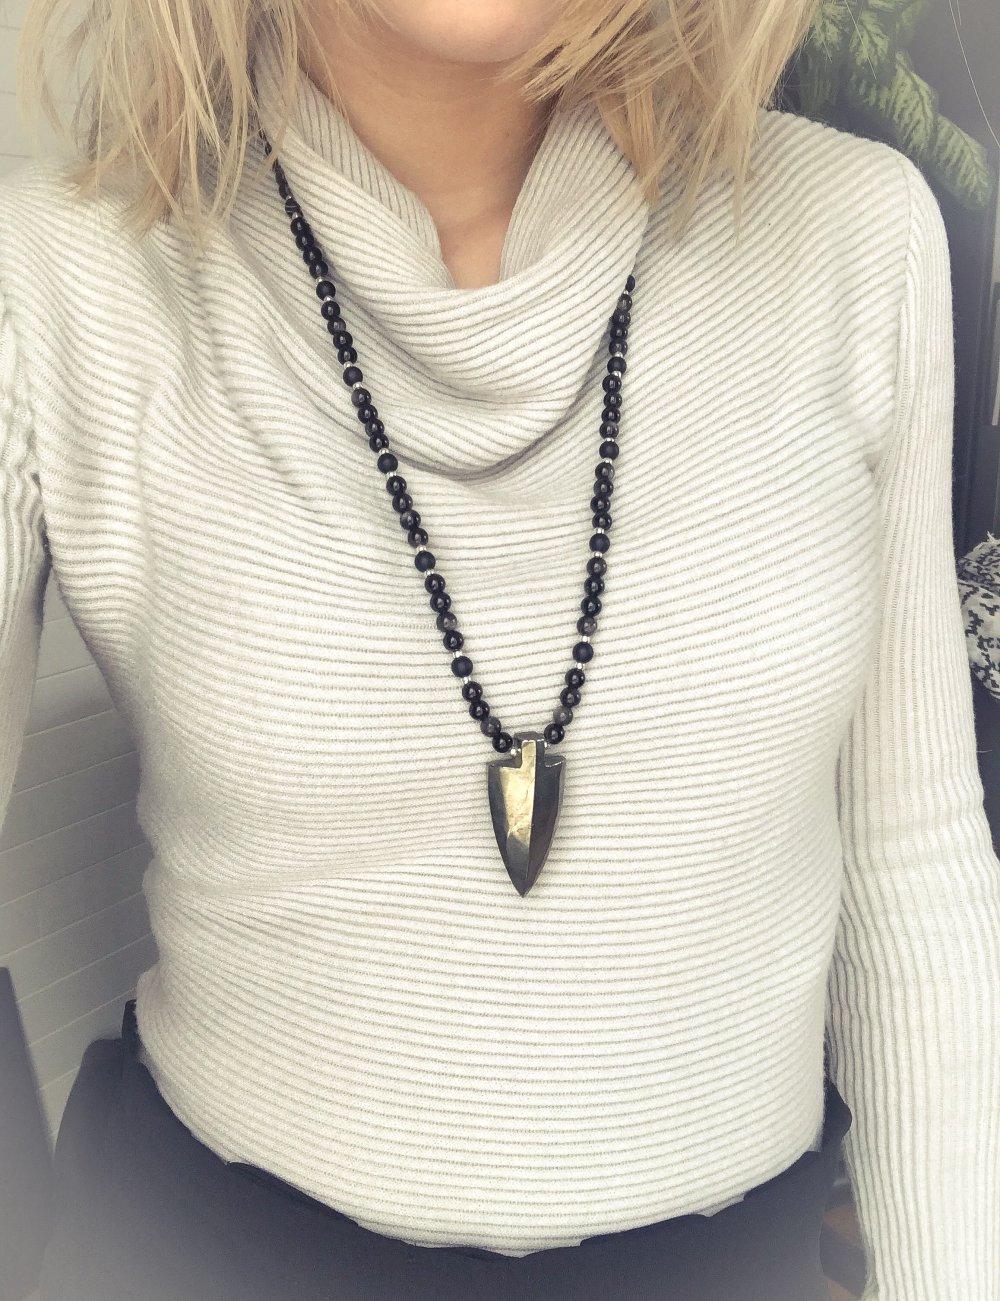 collier sautoir EVAN, flèche tribale en Pyrite, perles Obsidienne